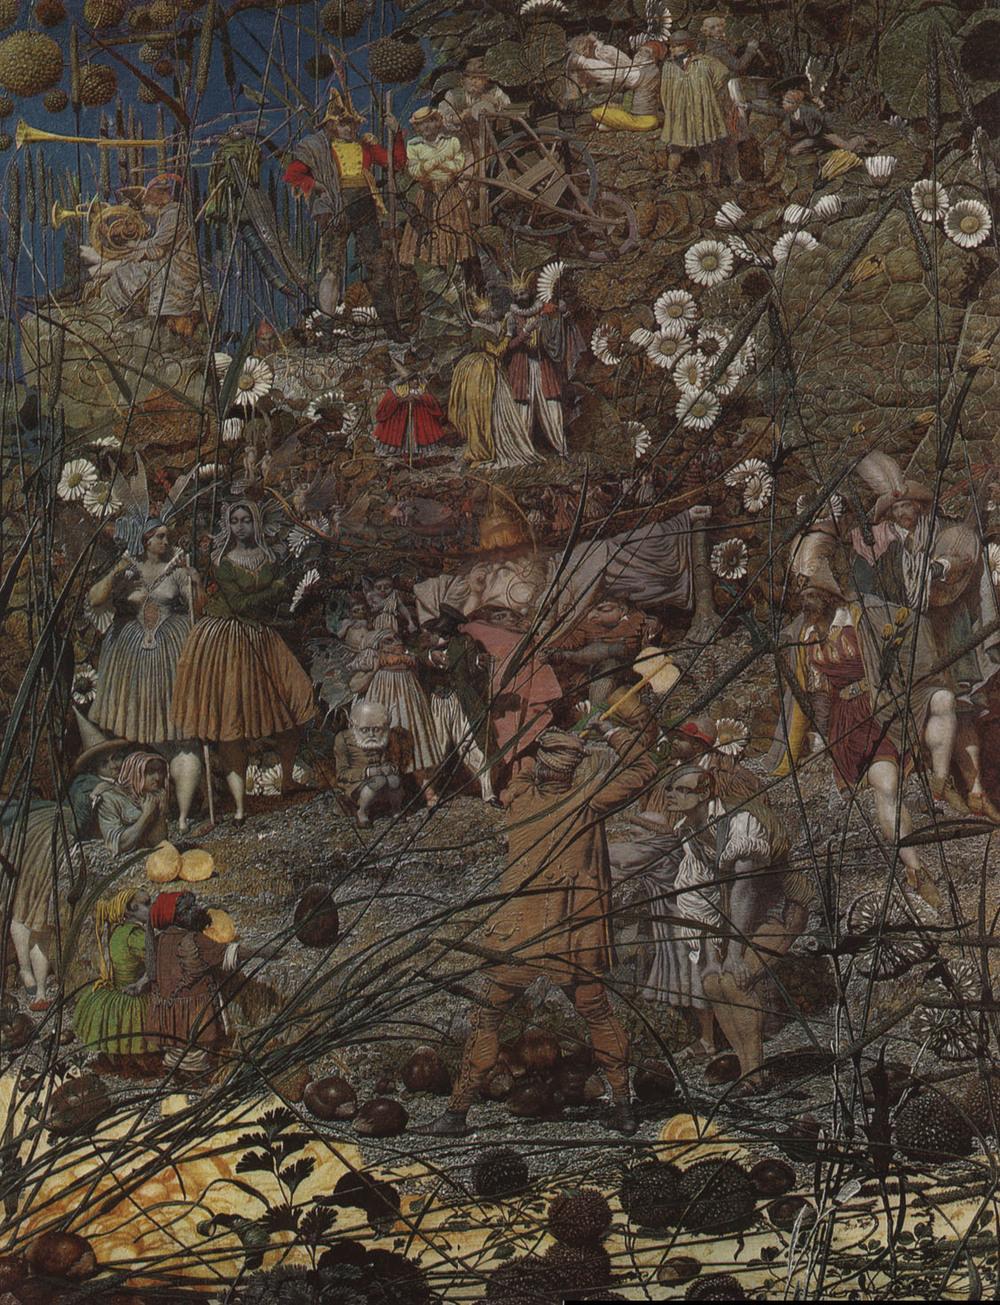 Richard Dadd,  The Fairy Feller's Master-Strok  e , 1855–64, Tate Gallery, London.